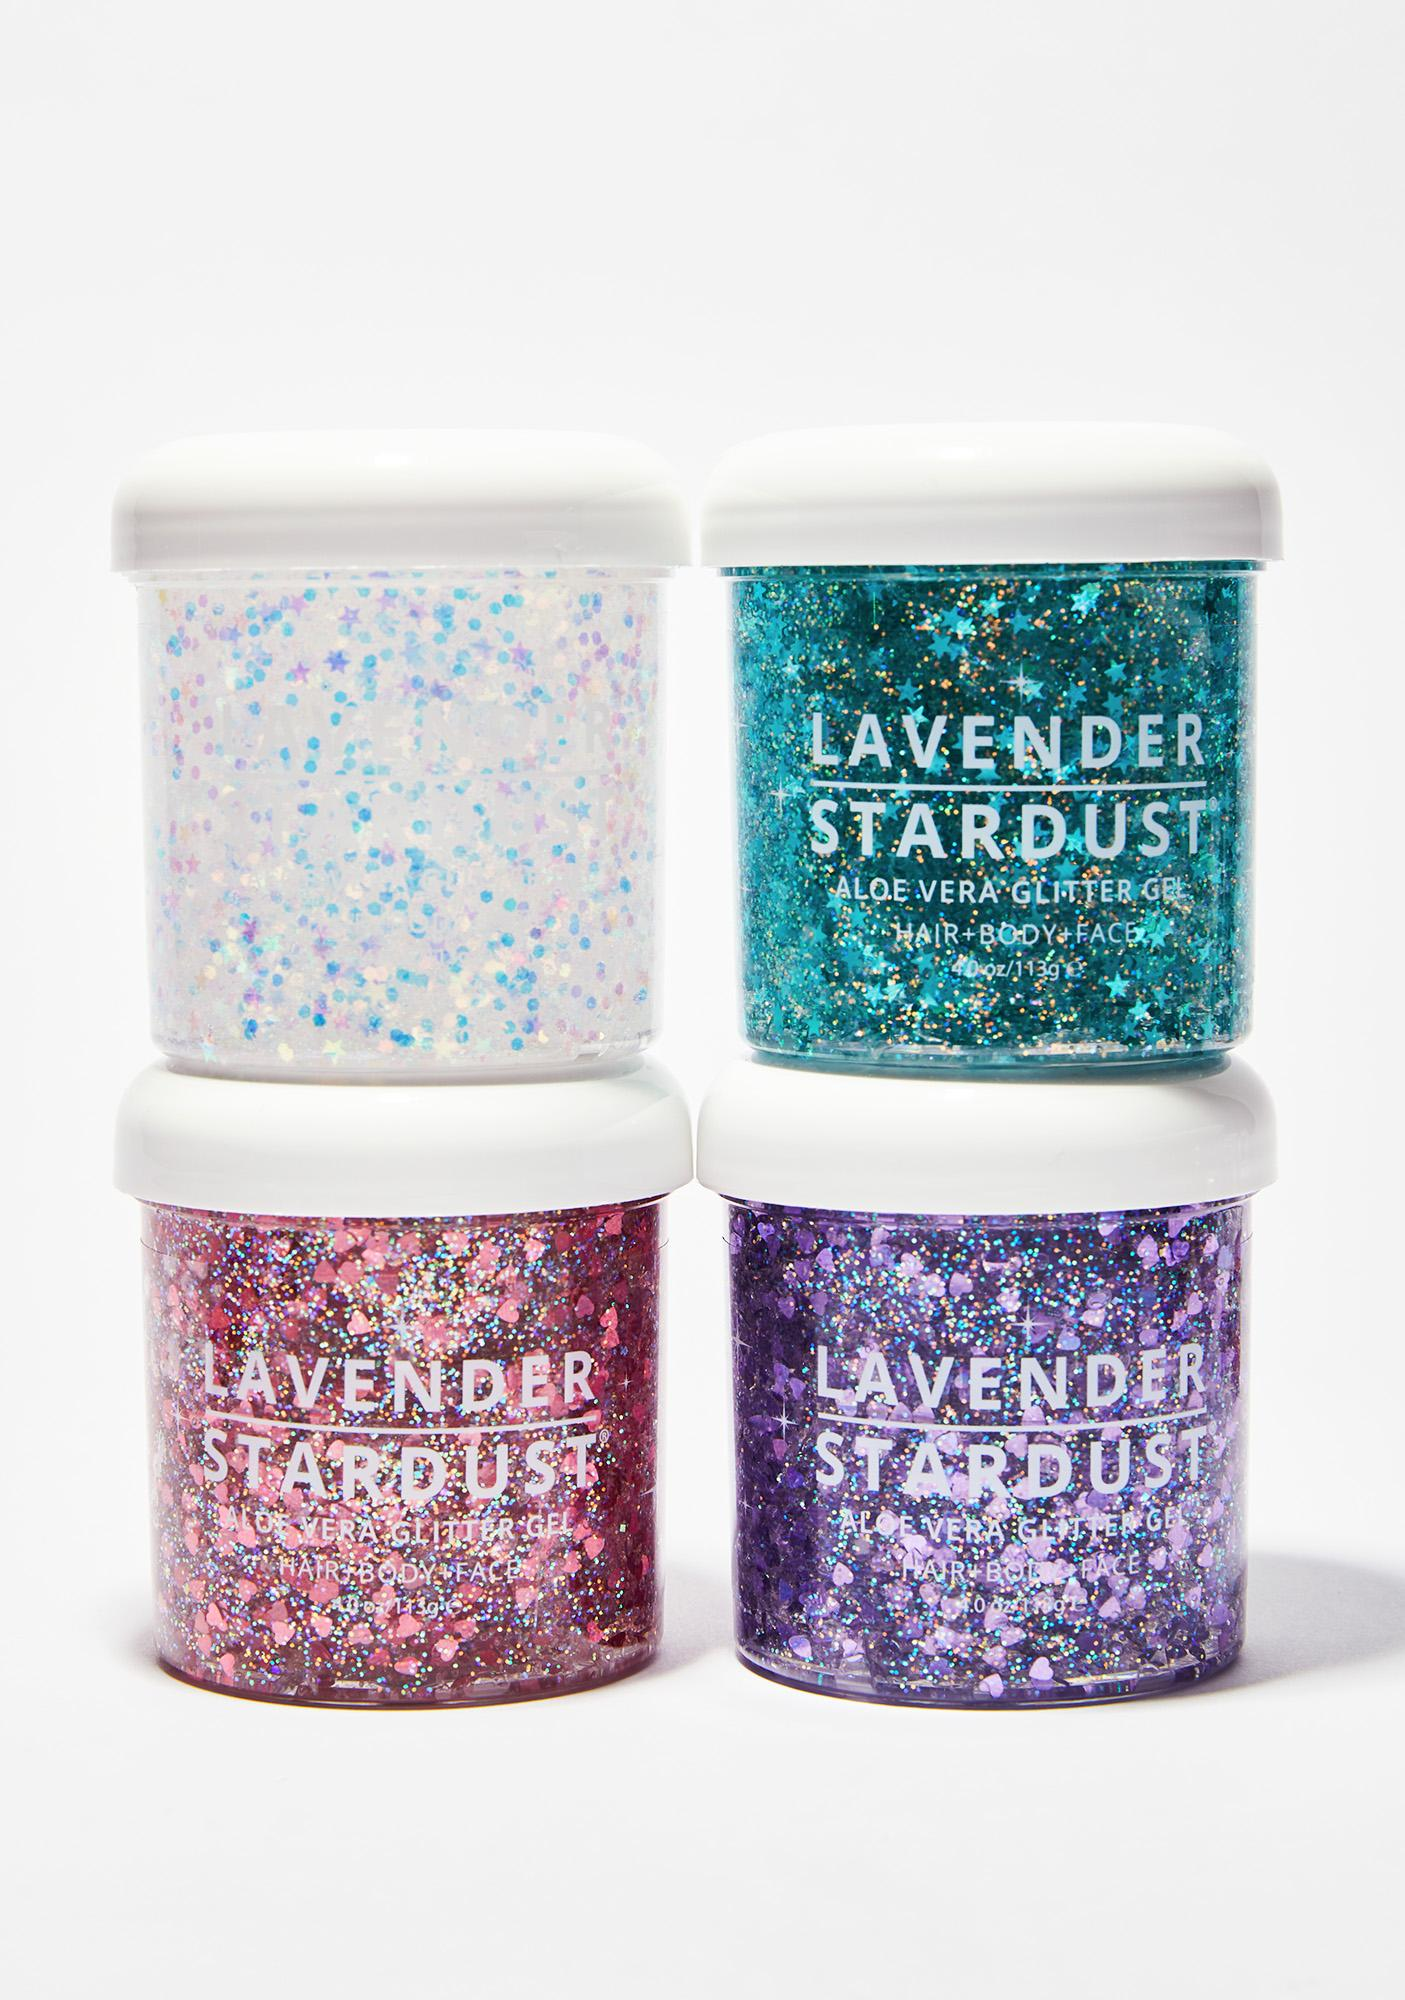 Lavender Stardust Mermaid Stardust Glitter Gel